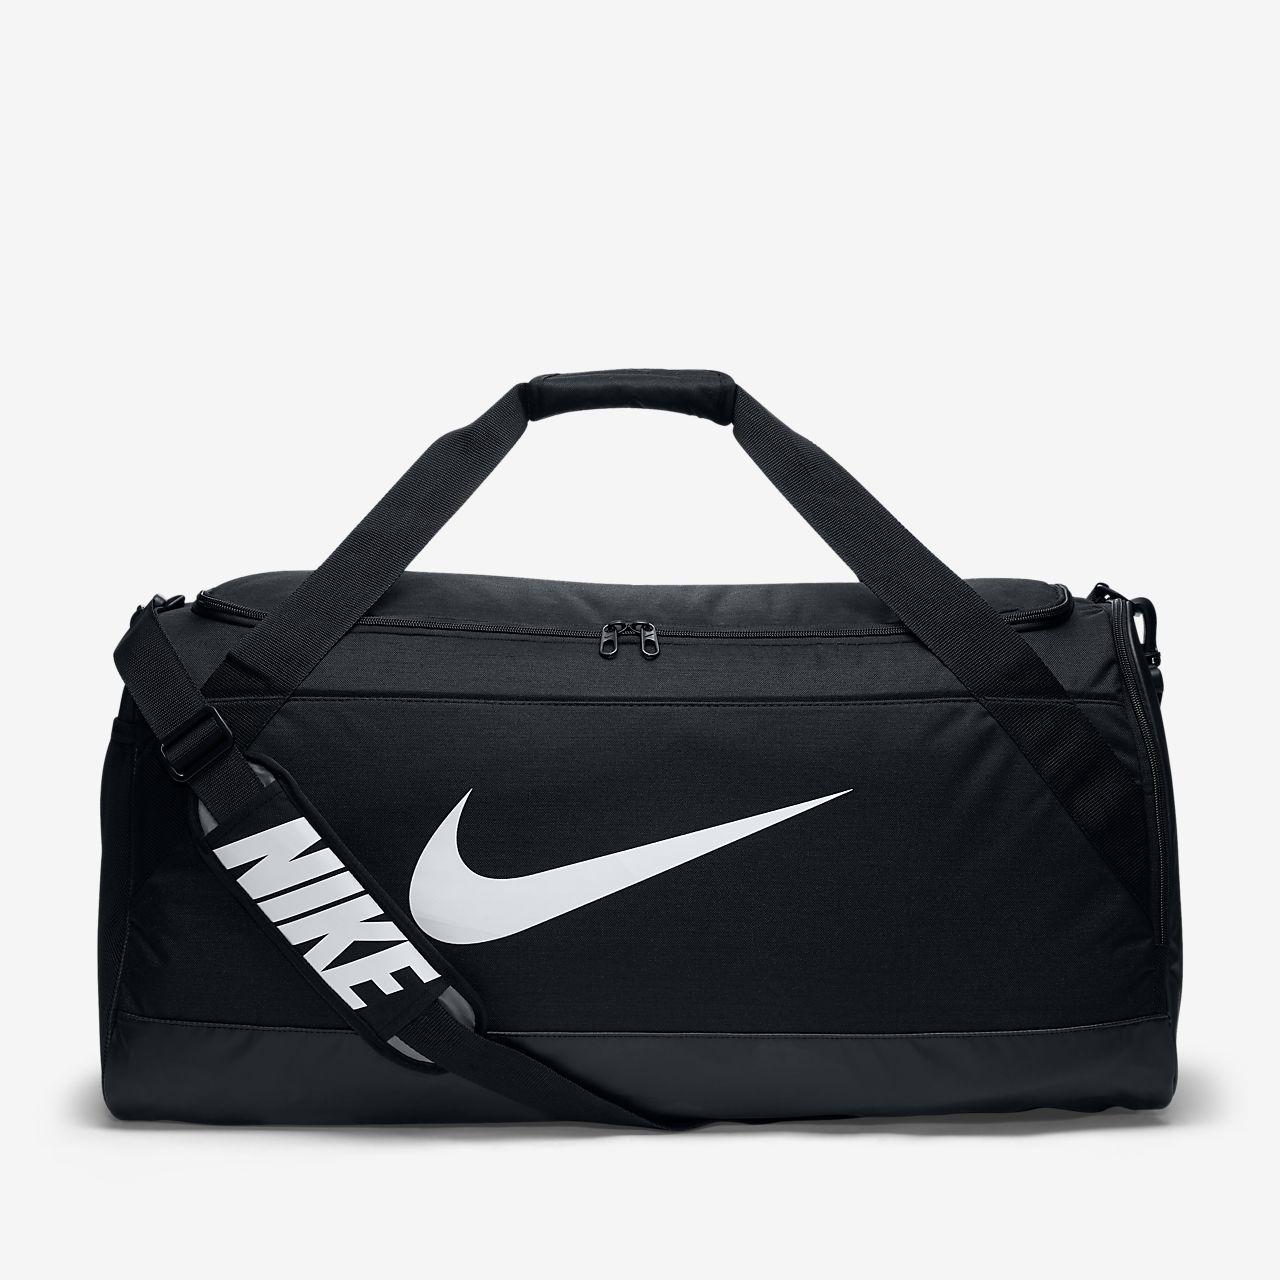 c95d8a4dd9 Sac de sport de training Nike Brasilia (grande taille). Nike.com FR